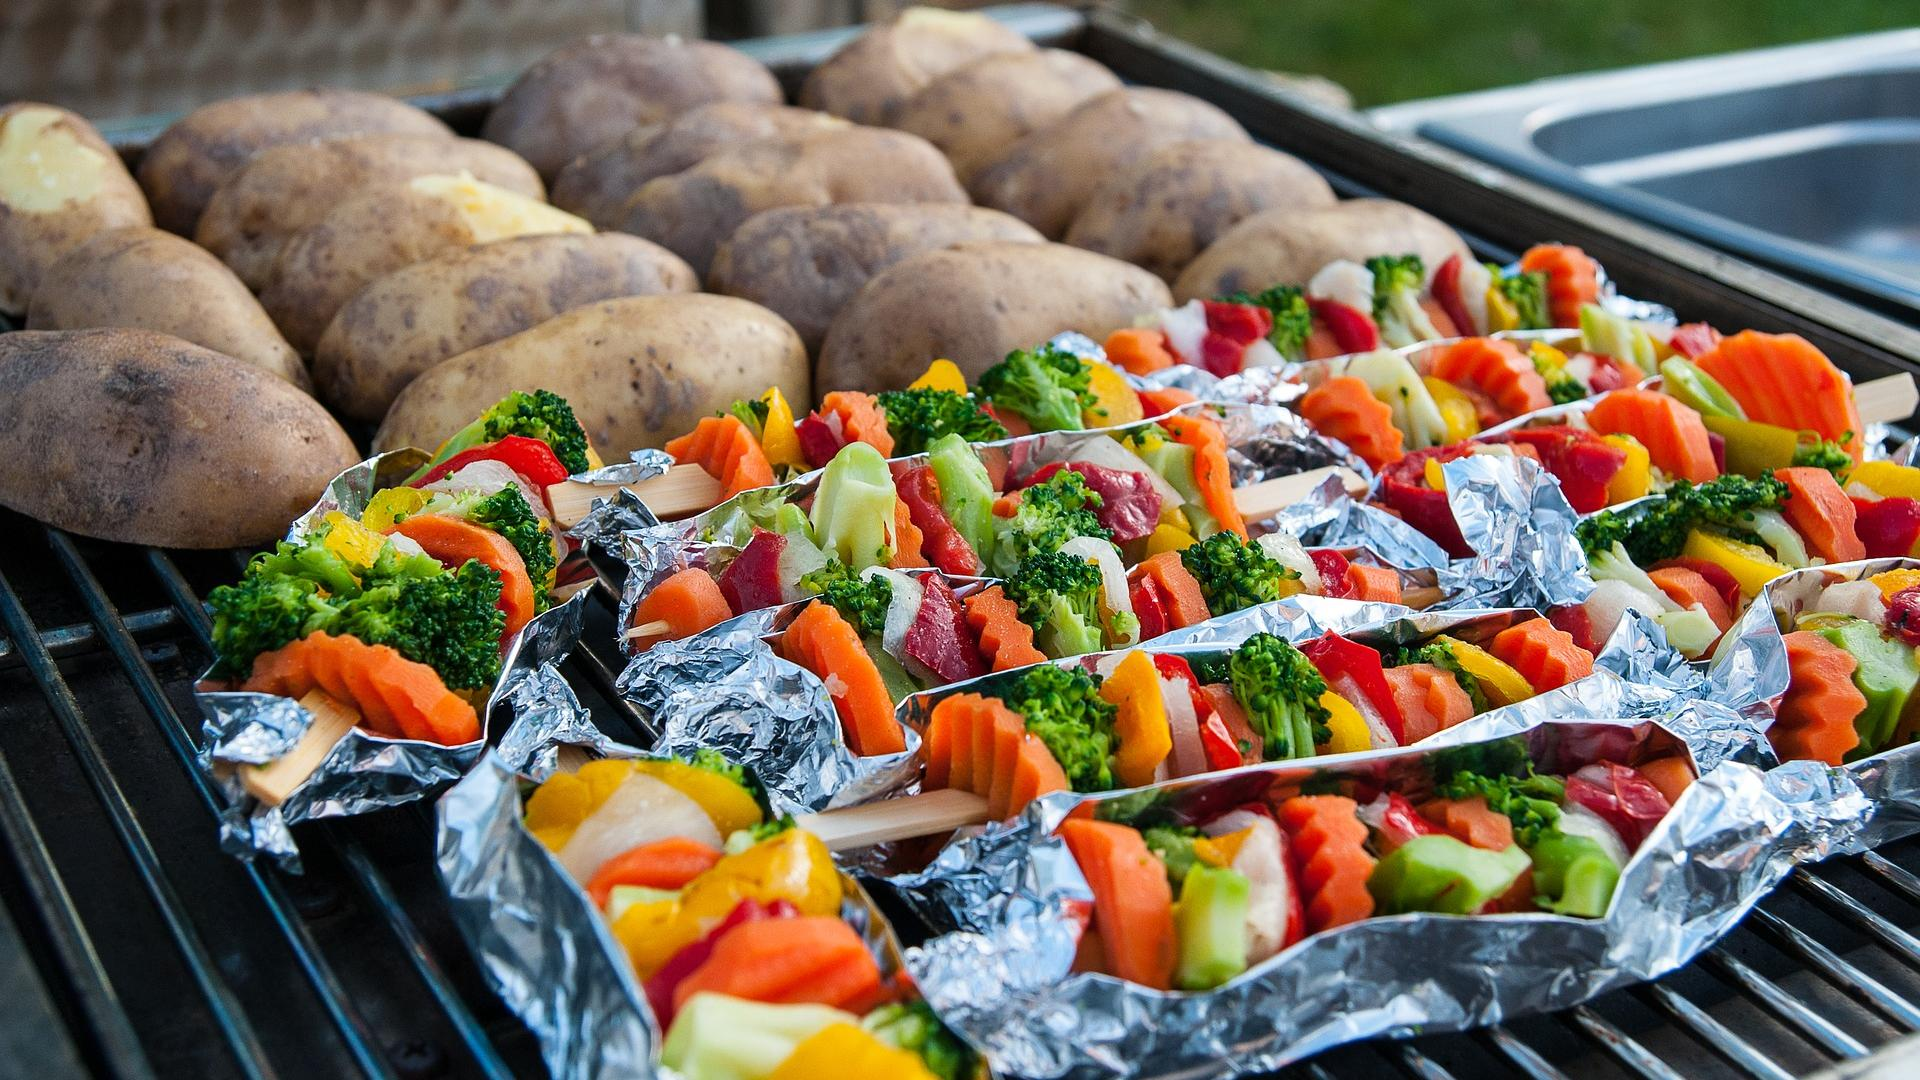 Auch vegetarisch kann man lecker grillen.